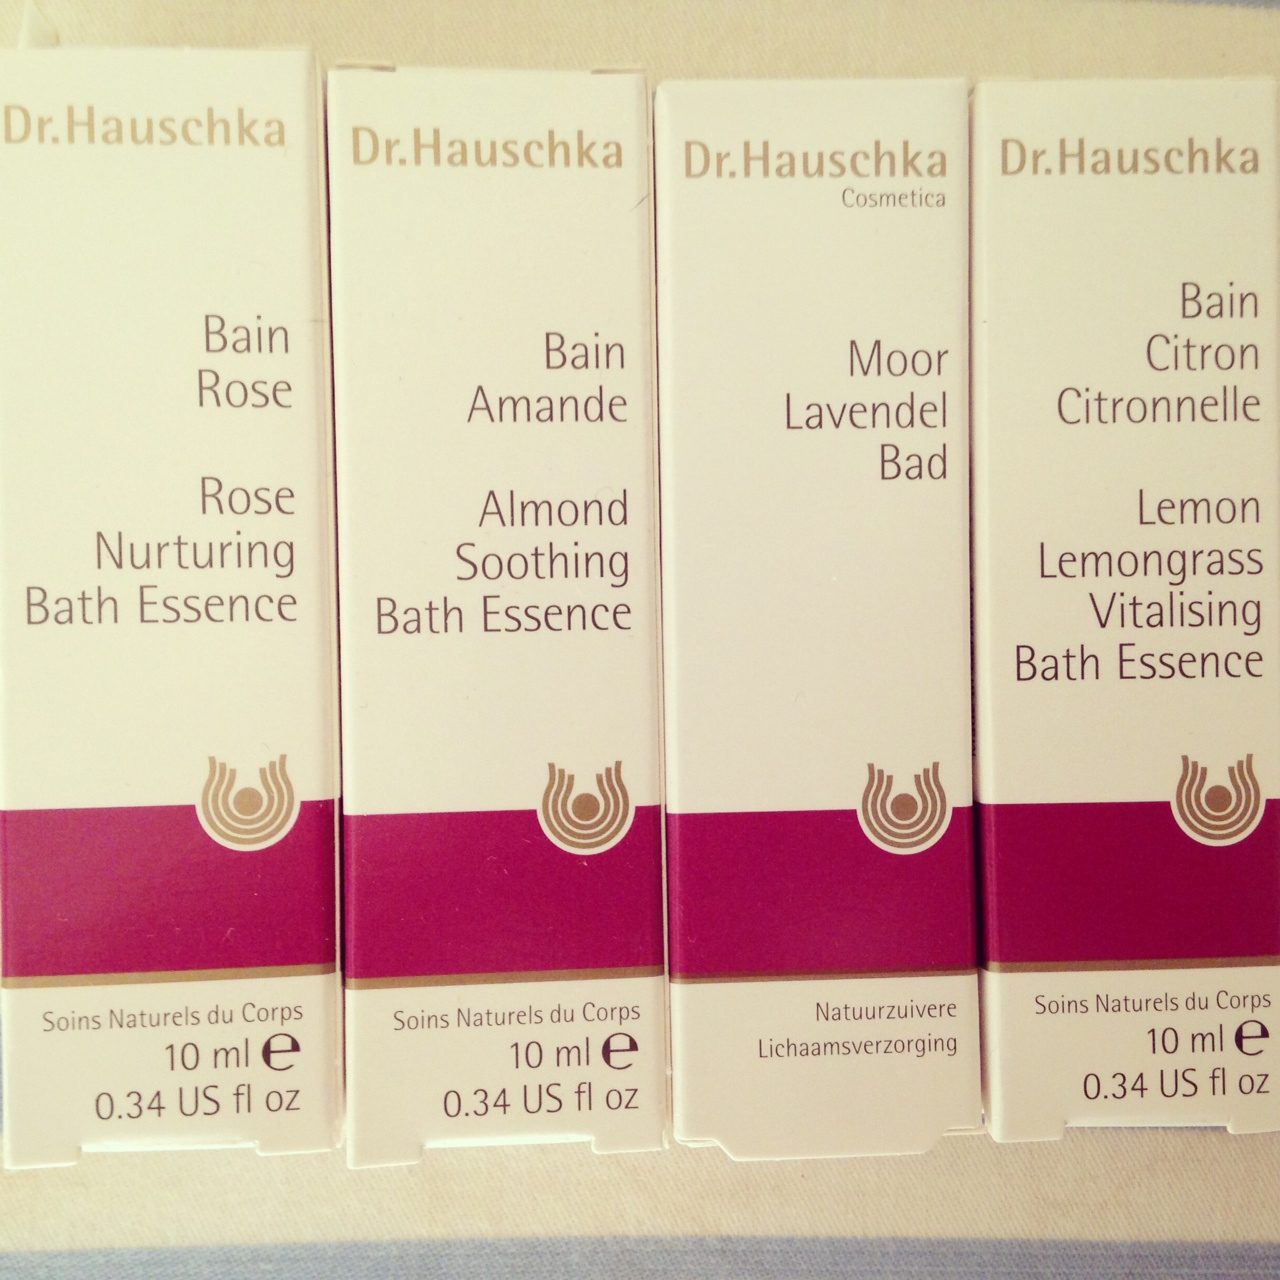 Dr Hauschka badolja skönhetsblogg elinfagerberg.se